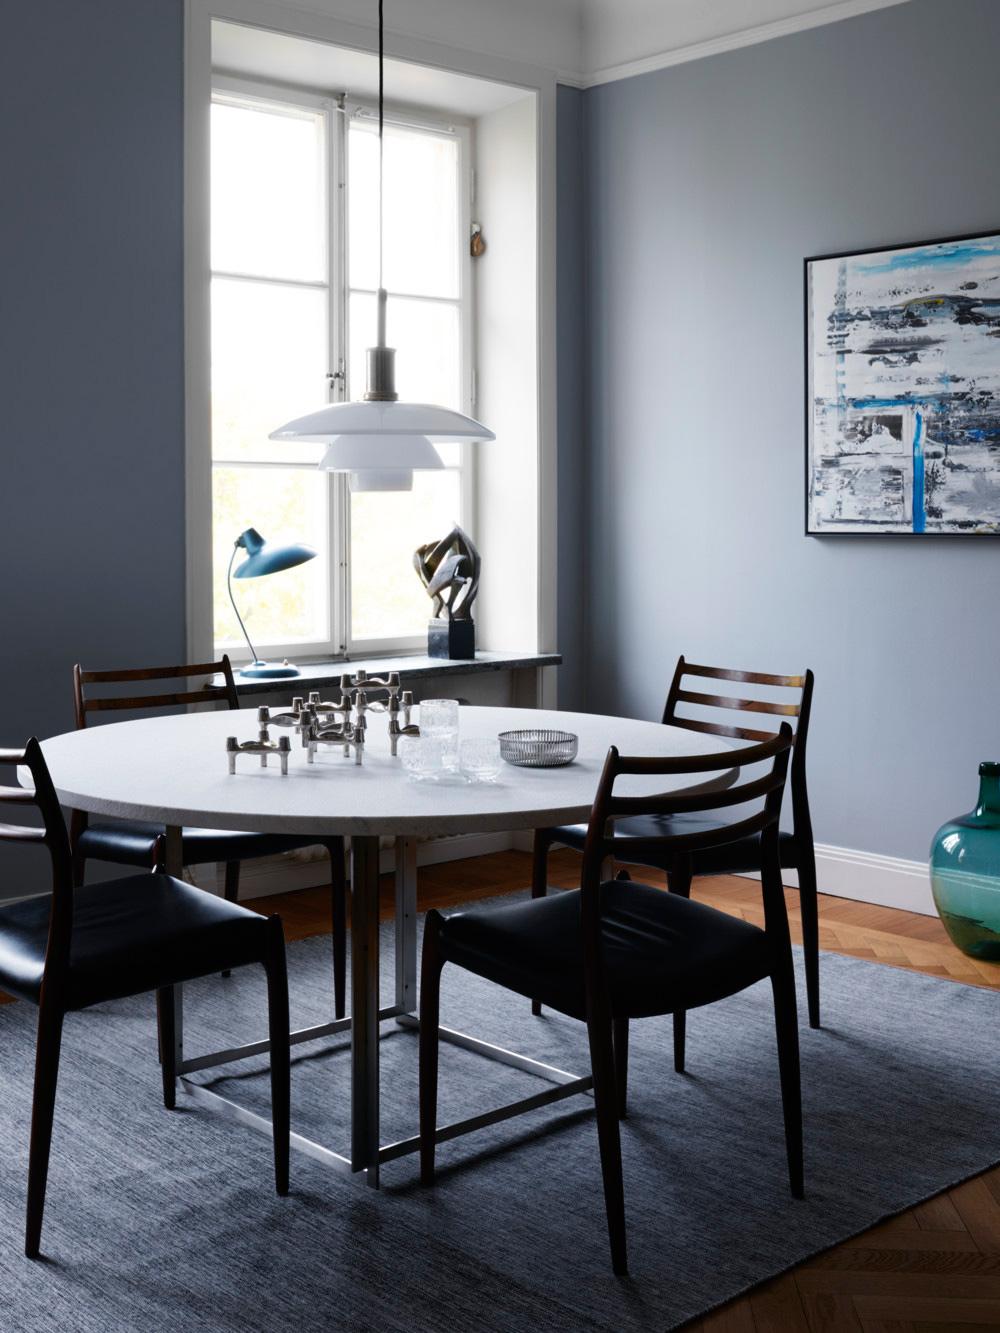 Take a Peek Into a Beautiful Home Filled with Scandinavian ...